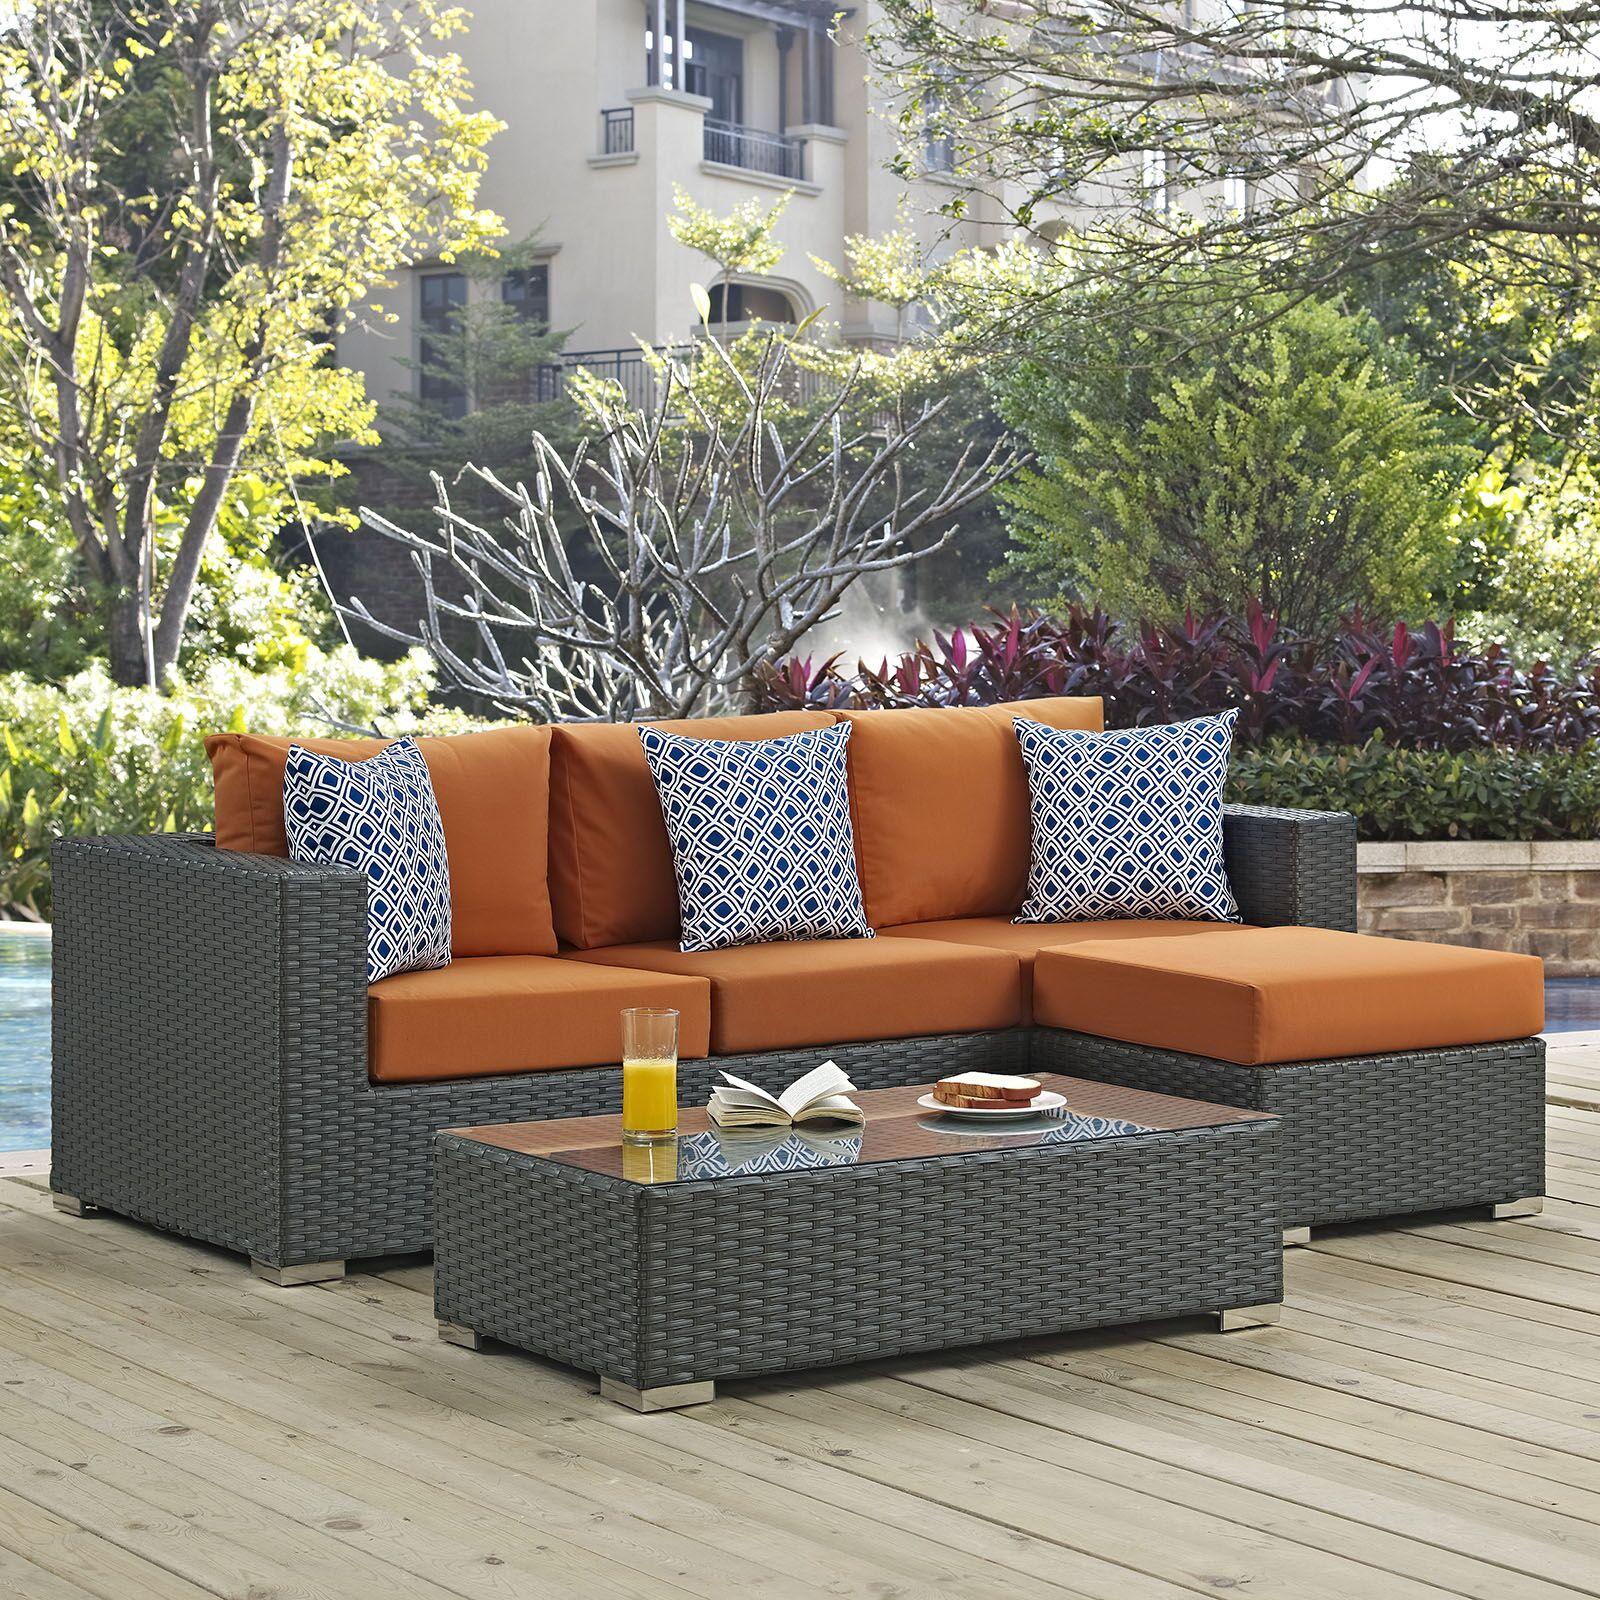 Tripp 3 Piece Sunbrella Sofa Set with Cushions Fabric: Tuscan